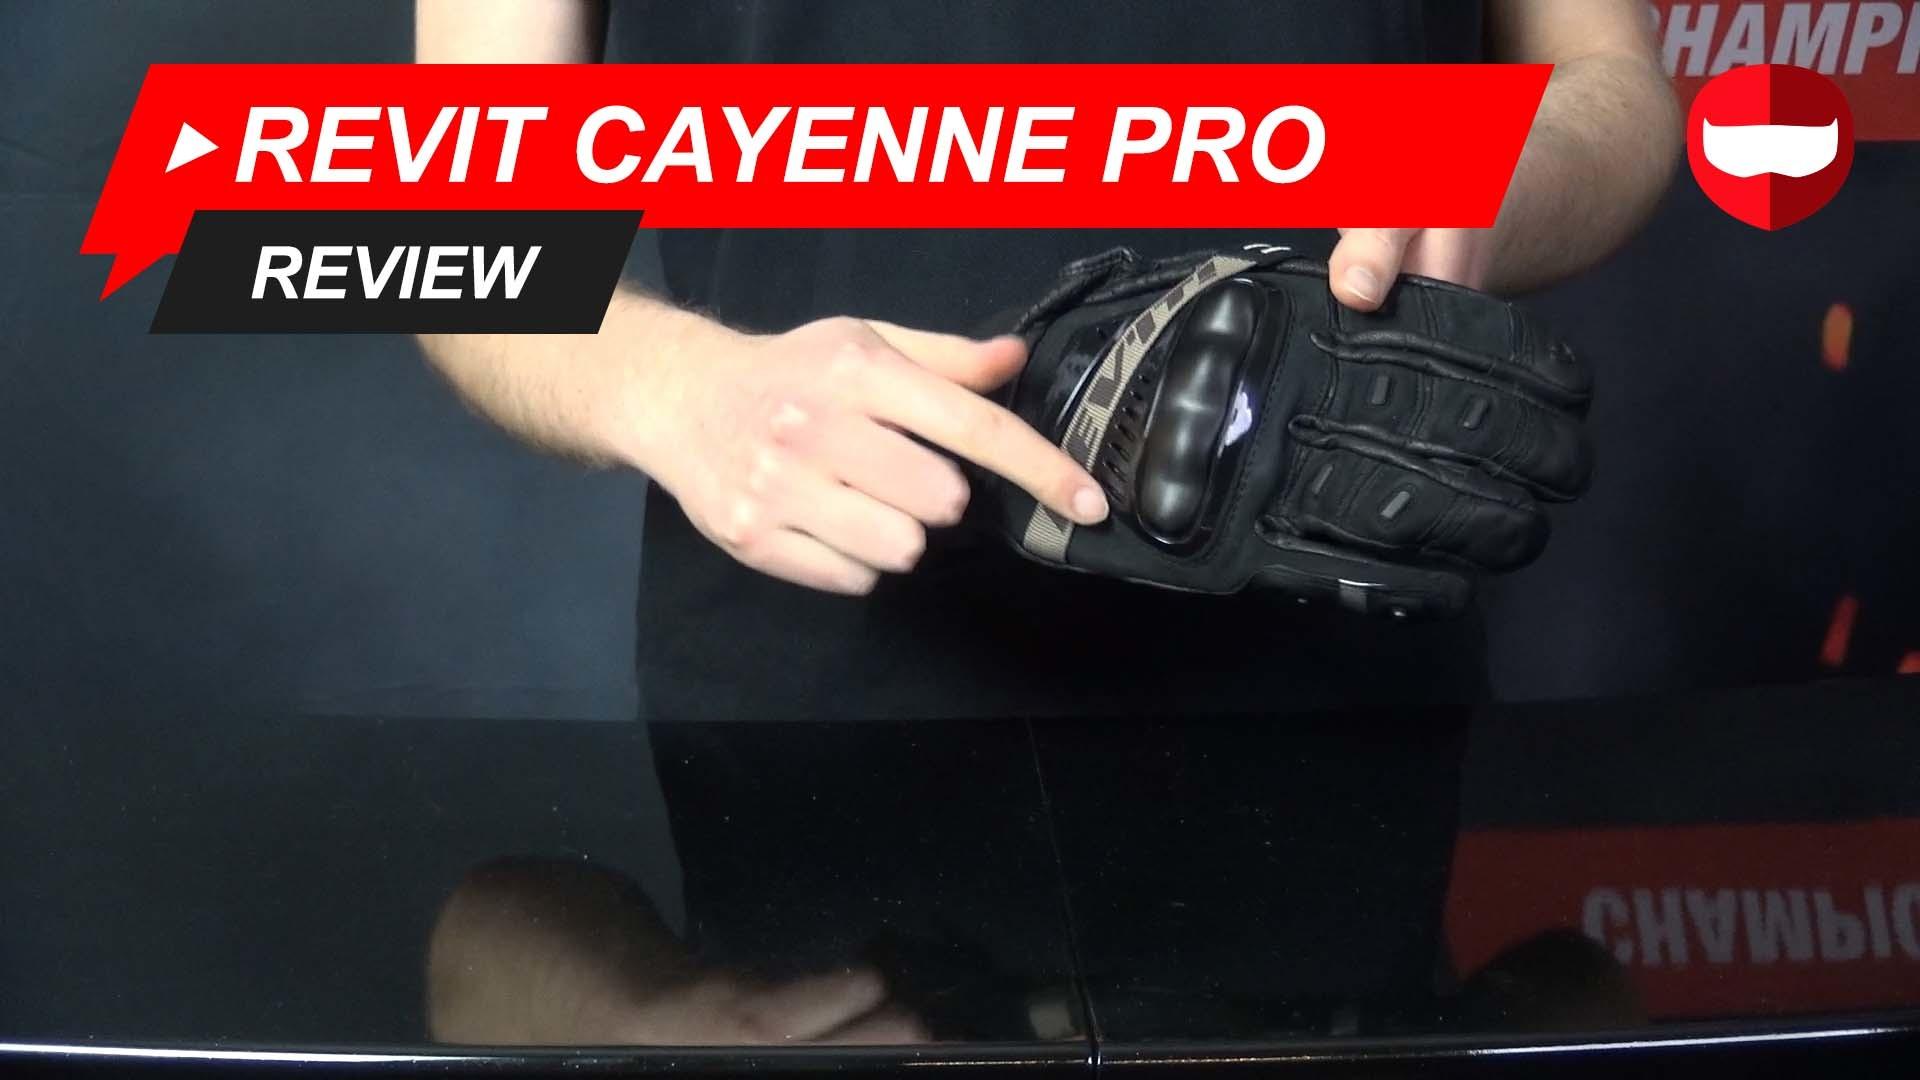 Revit Cayenne Pro Glove Review + Video